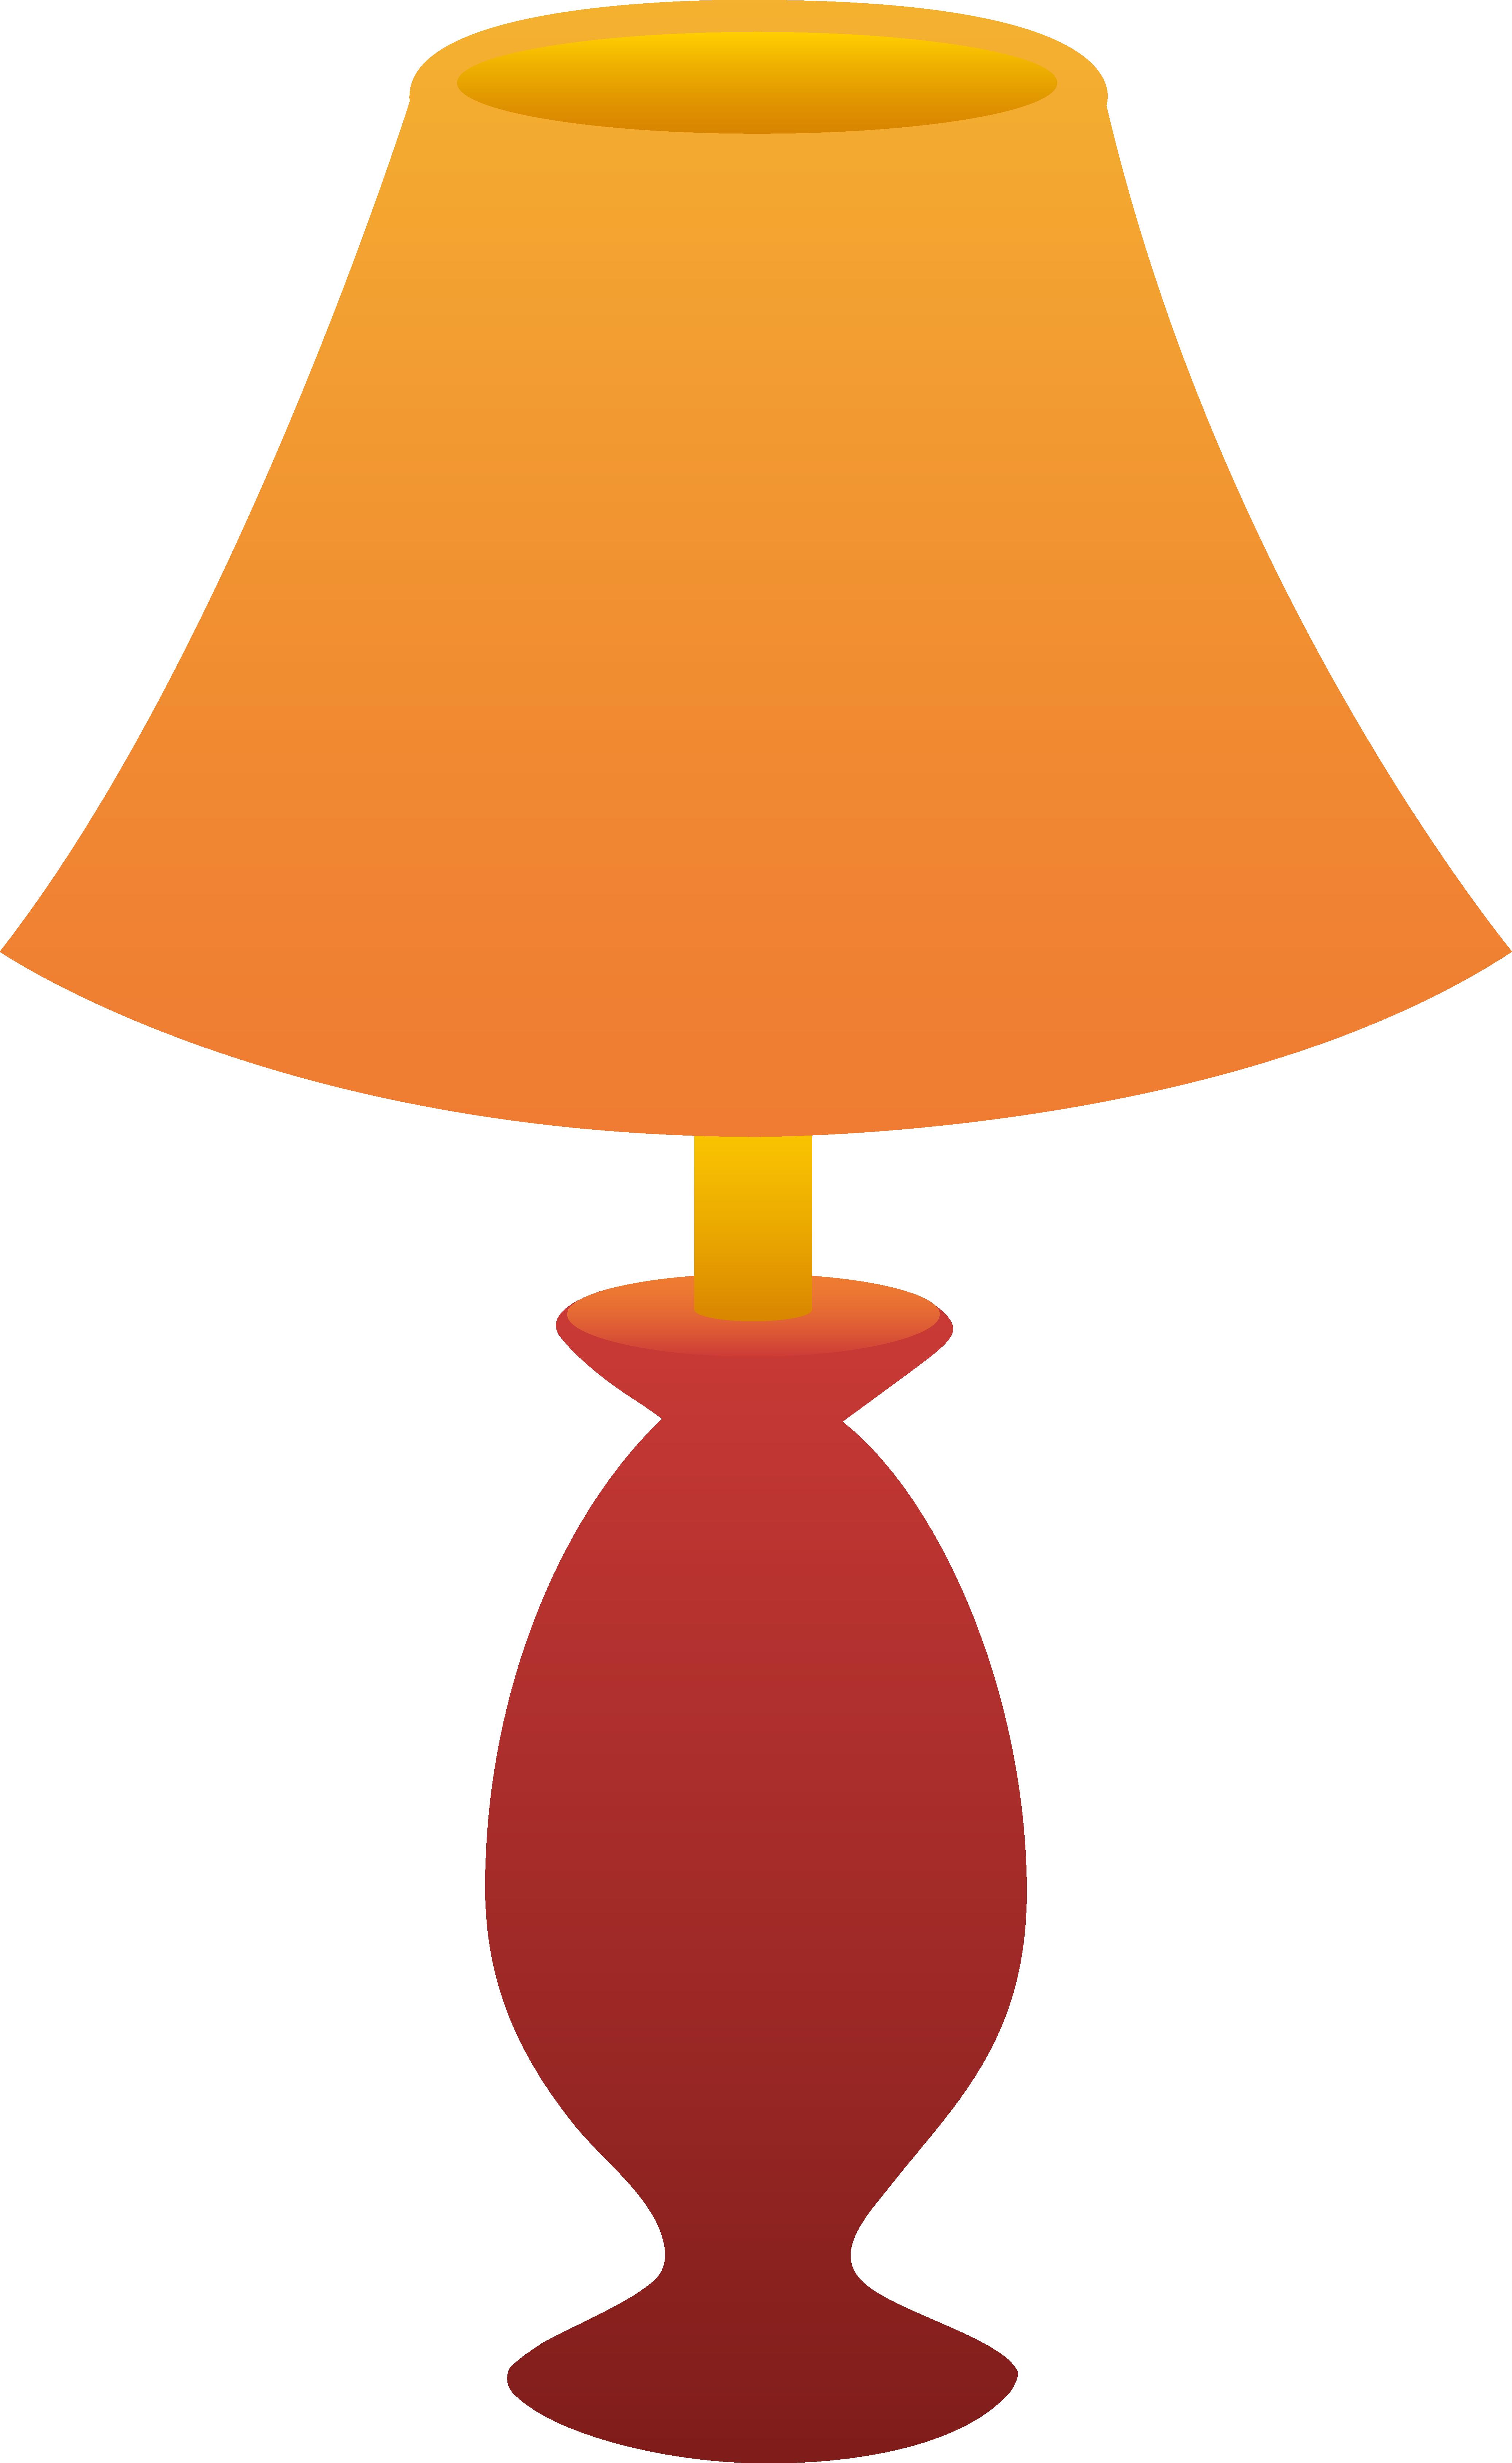 Floor clipart cartoon. Lamp free